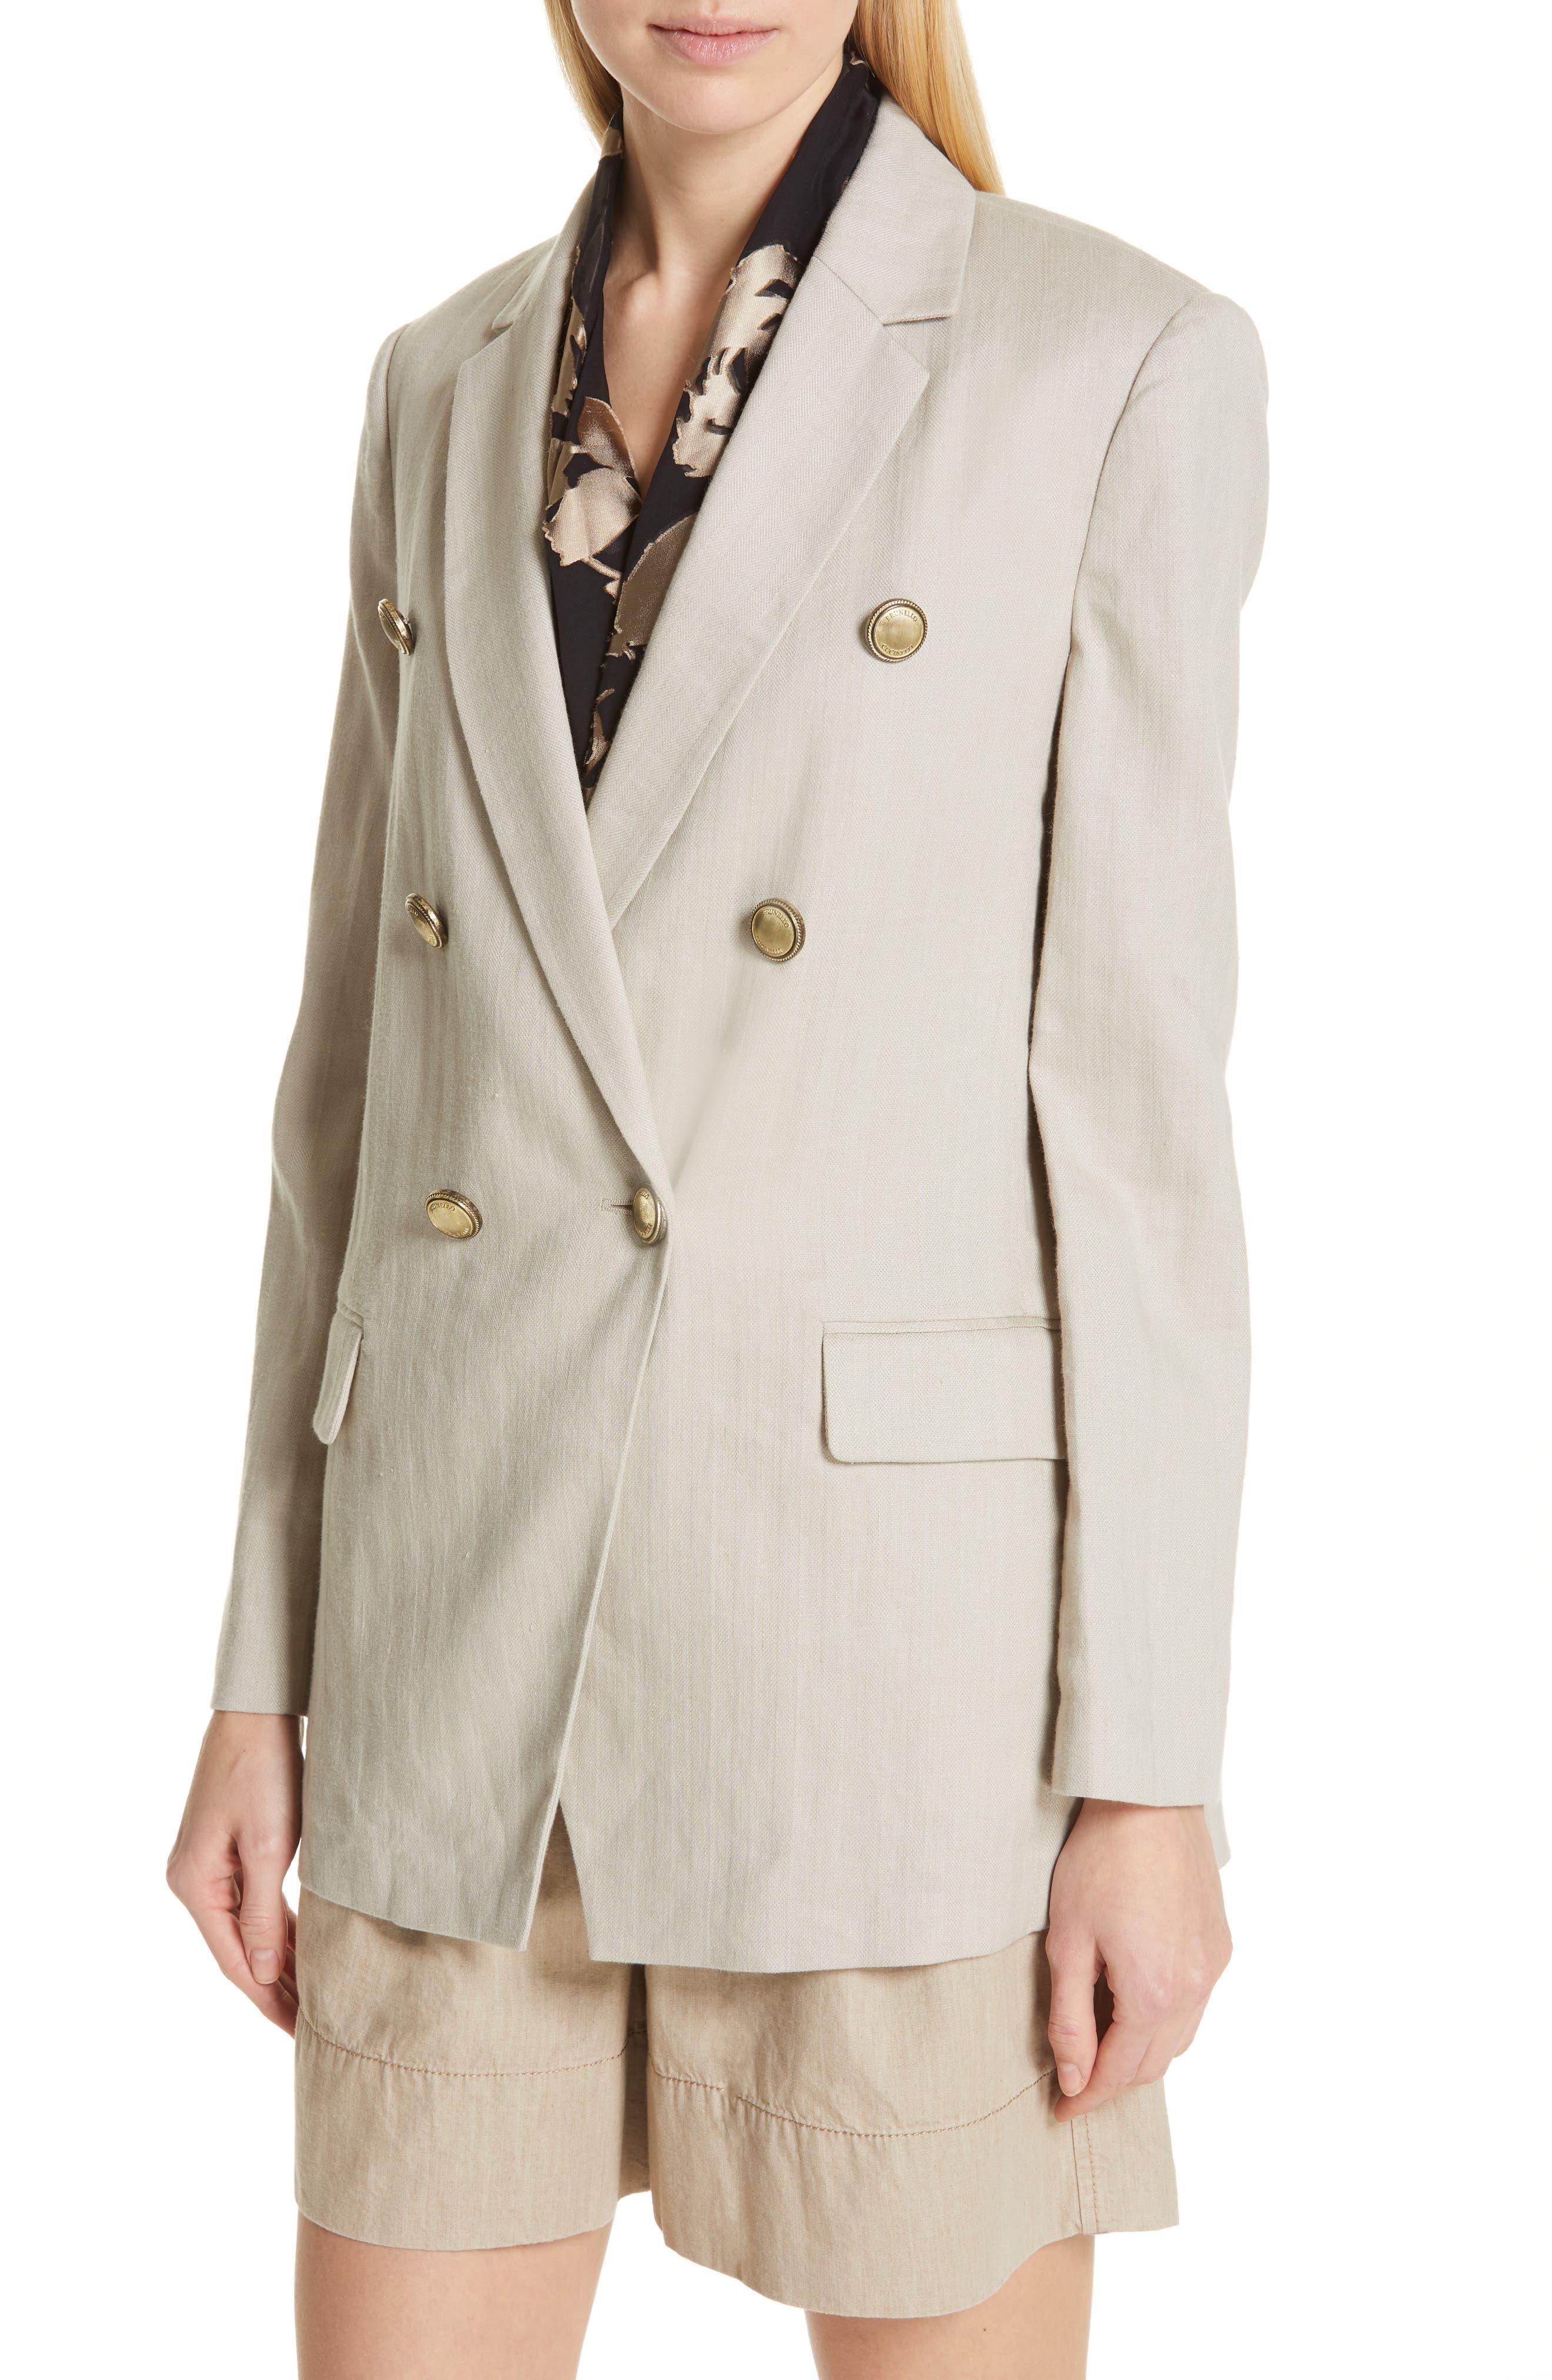 Chevron Weave Cotton & Linen Jacket,                             Alternate thumbnail 4, color,                             DESERT